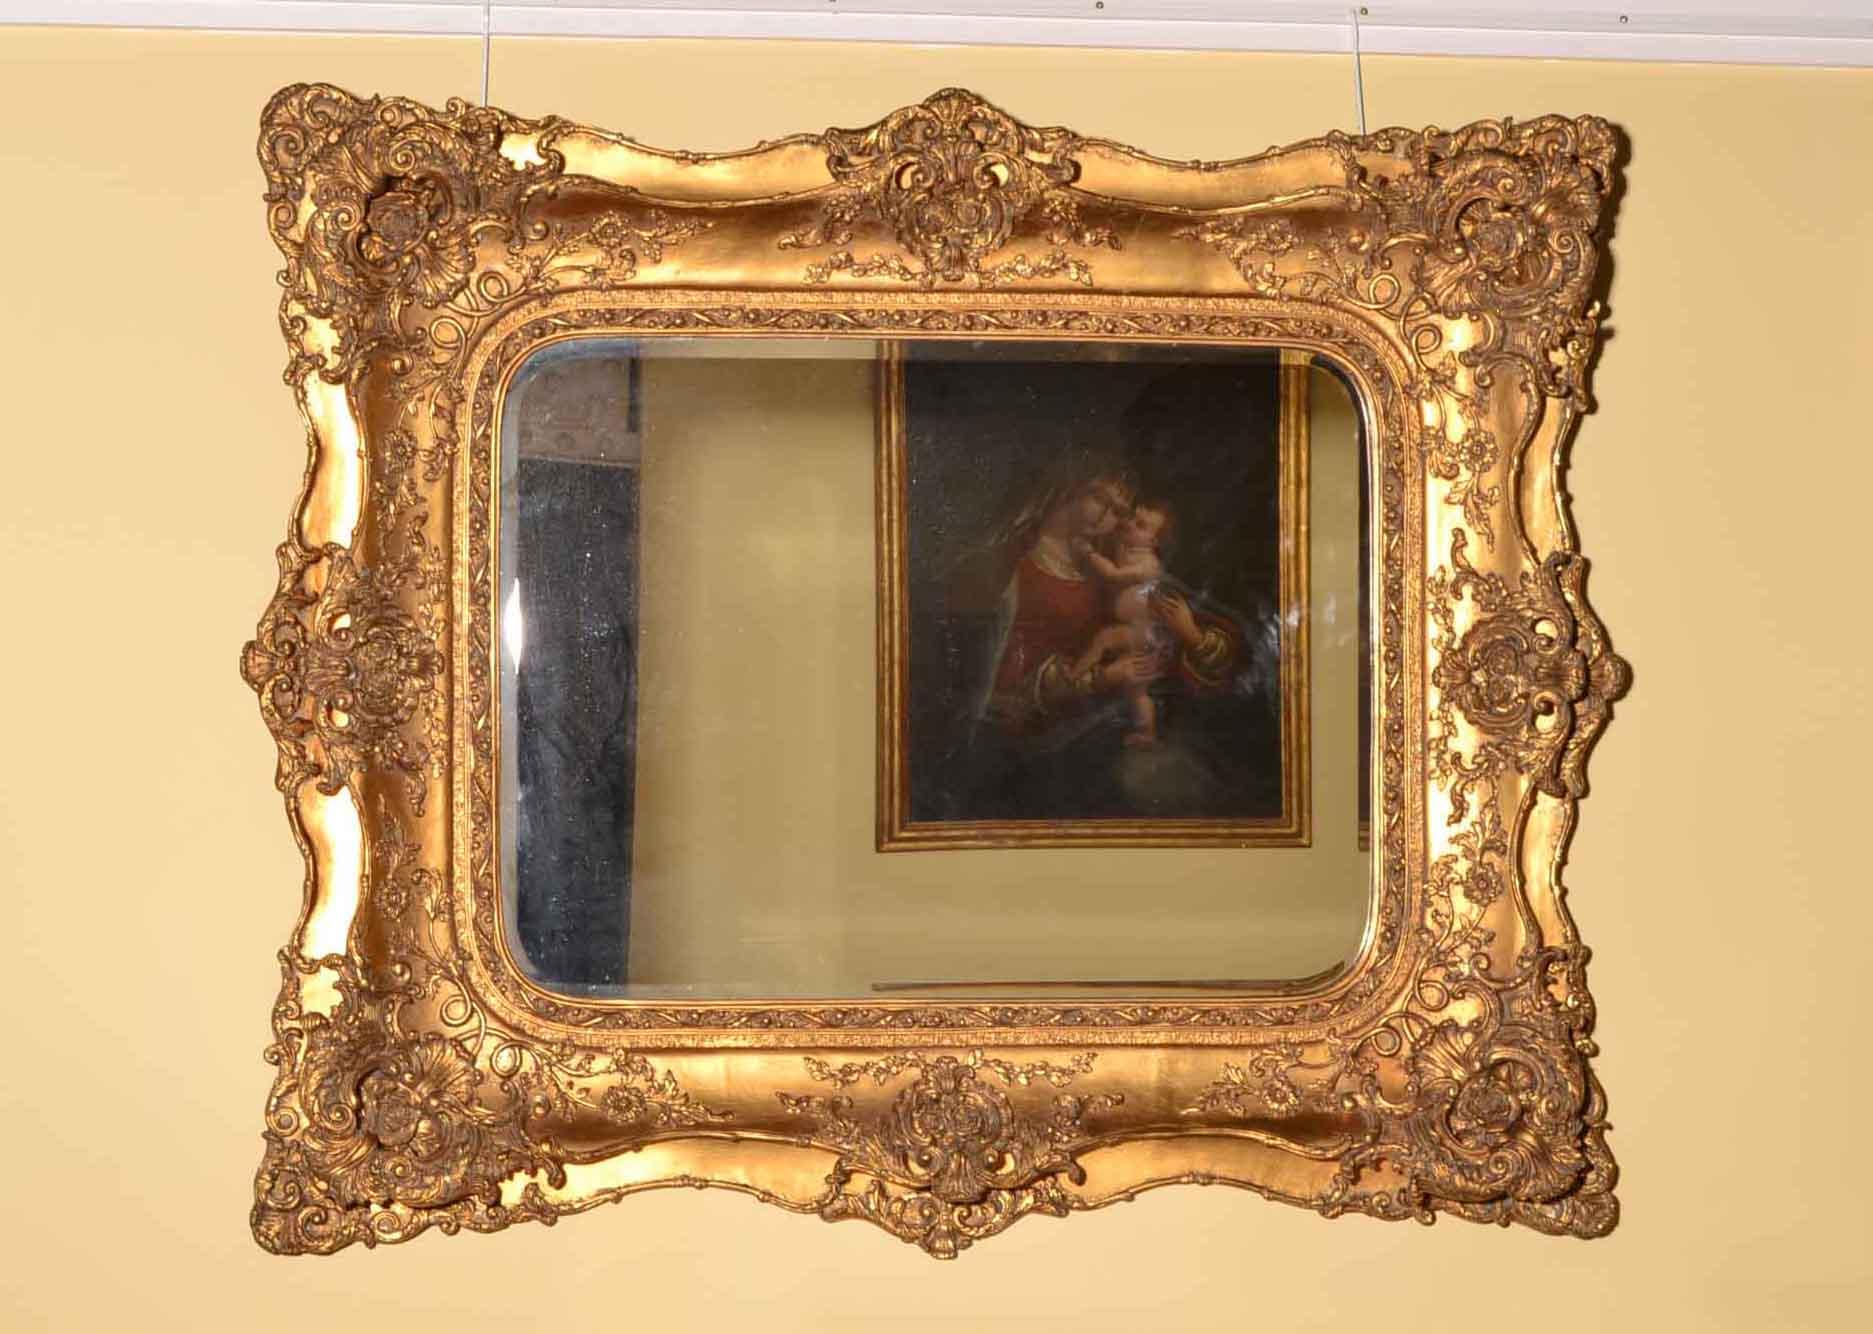 Regent antiques mirrors stunning large ornate italian for Ornate mirror